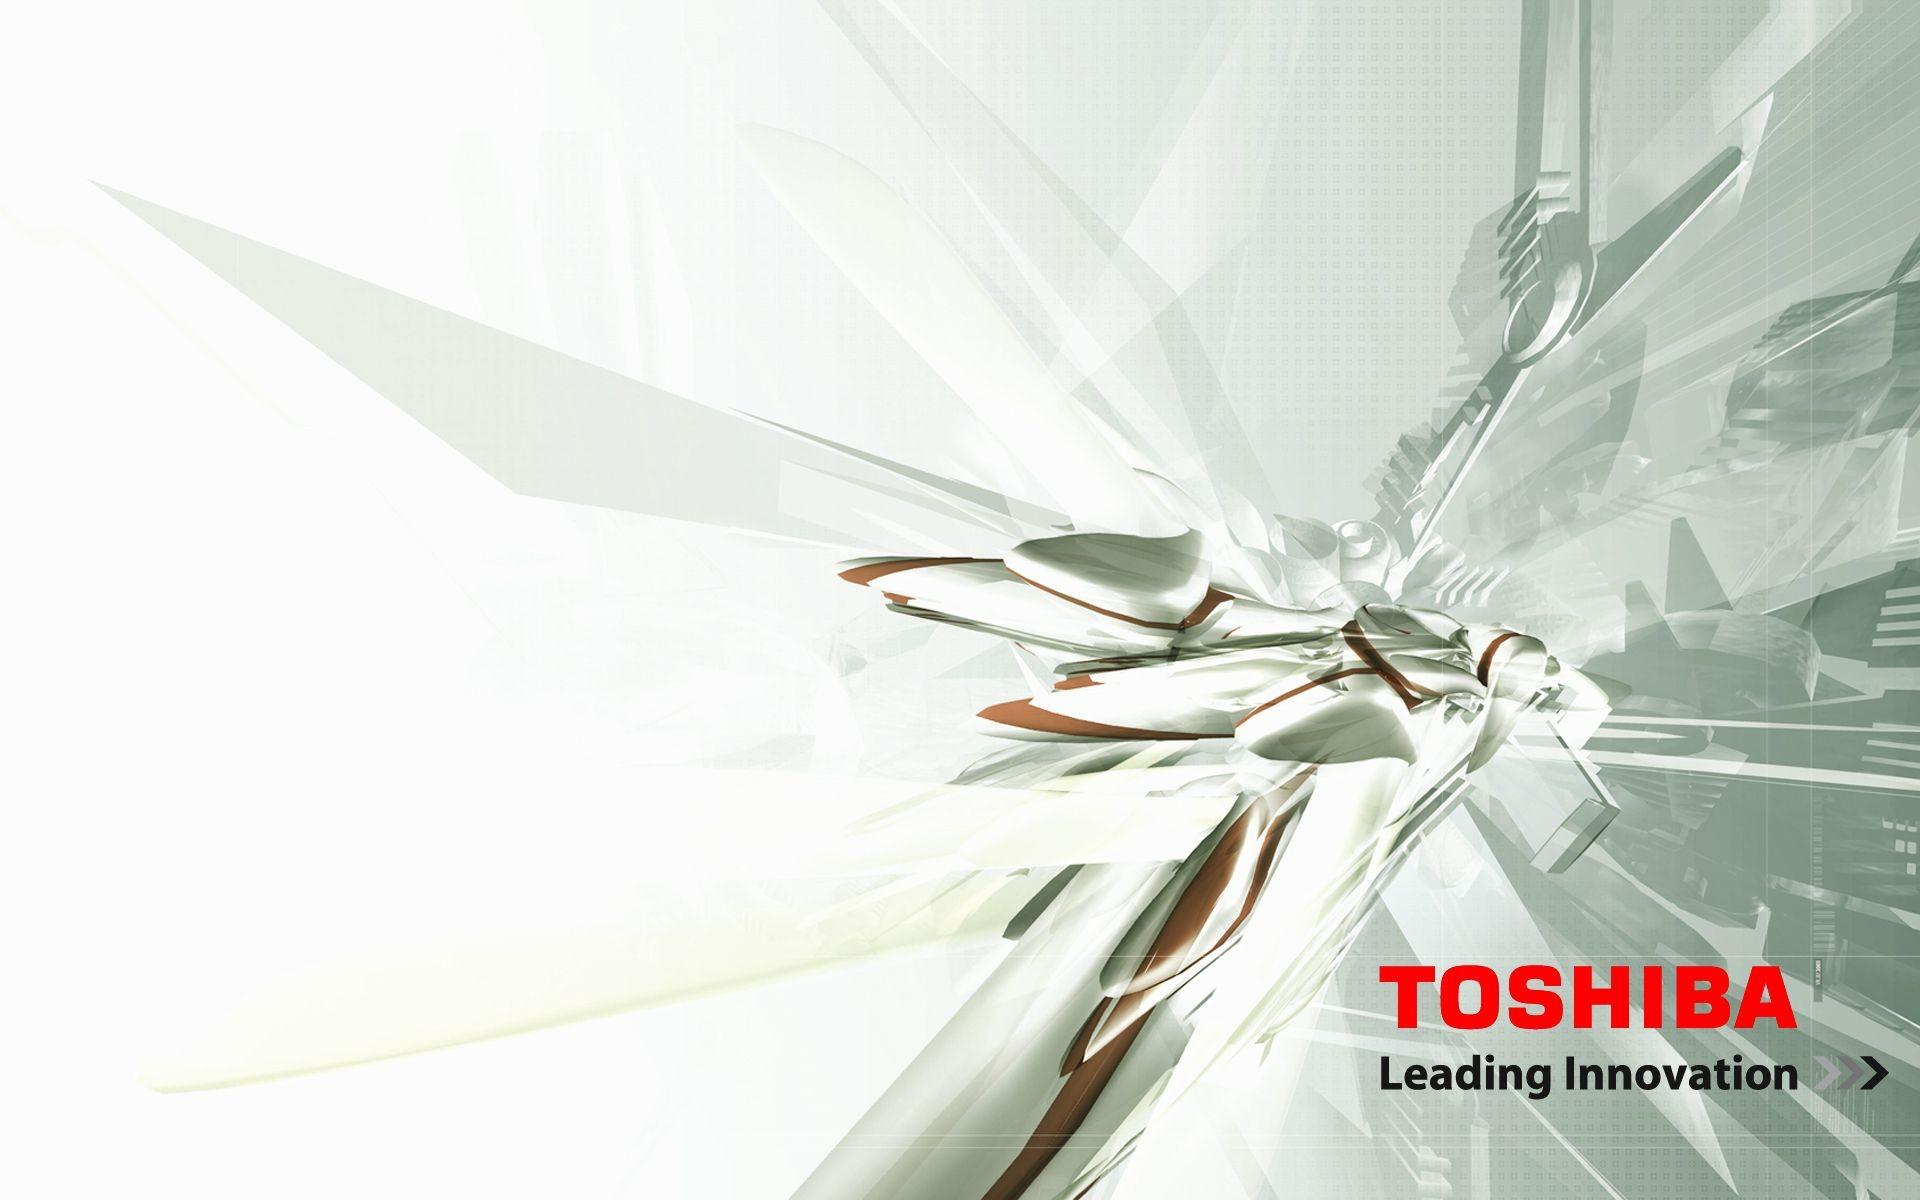 Toshiba Wallpaper HD